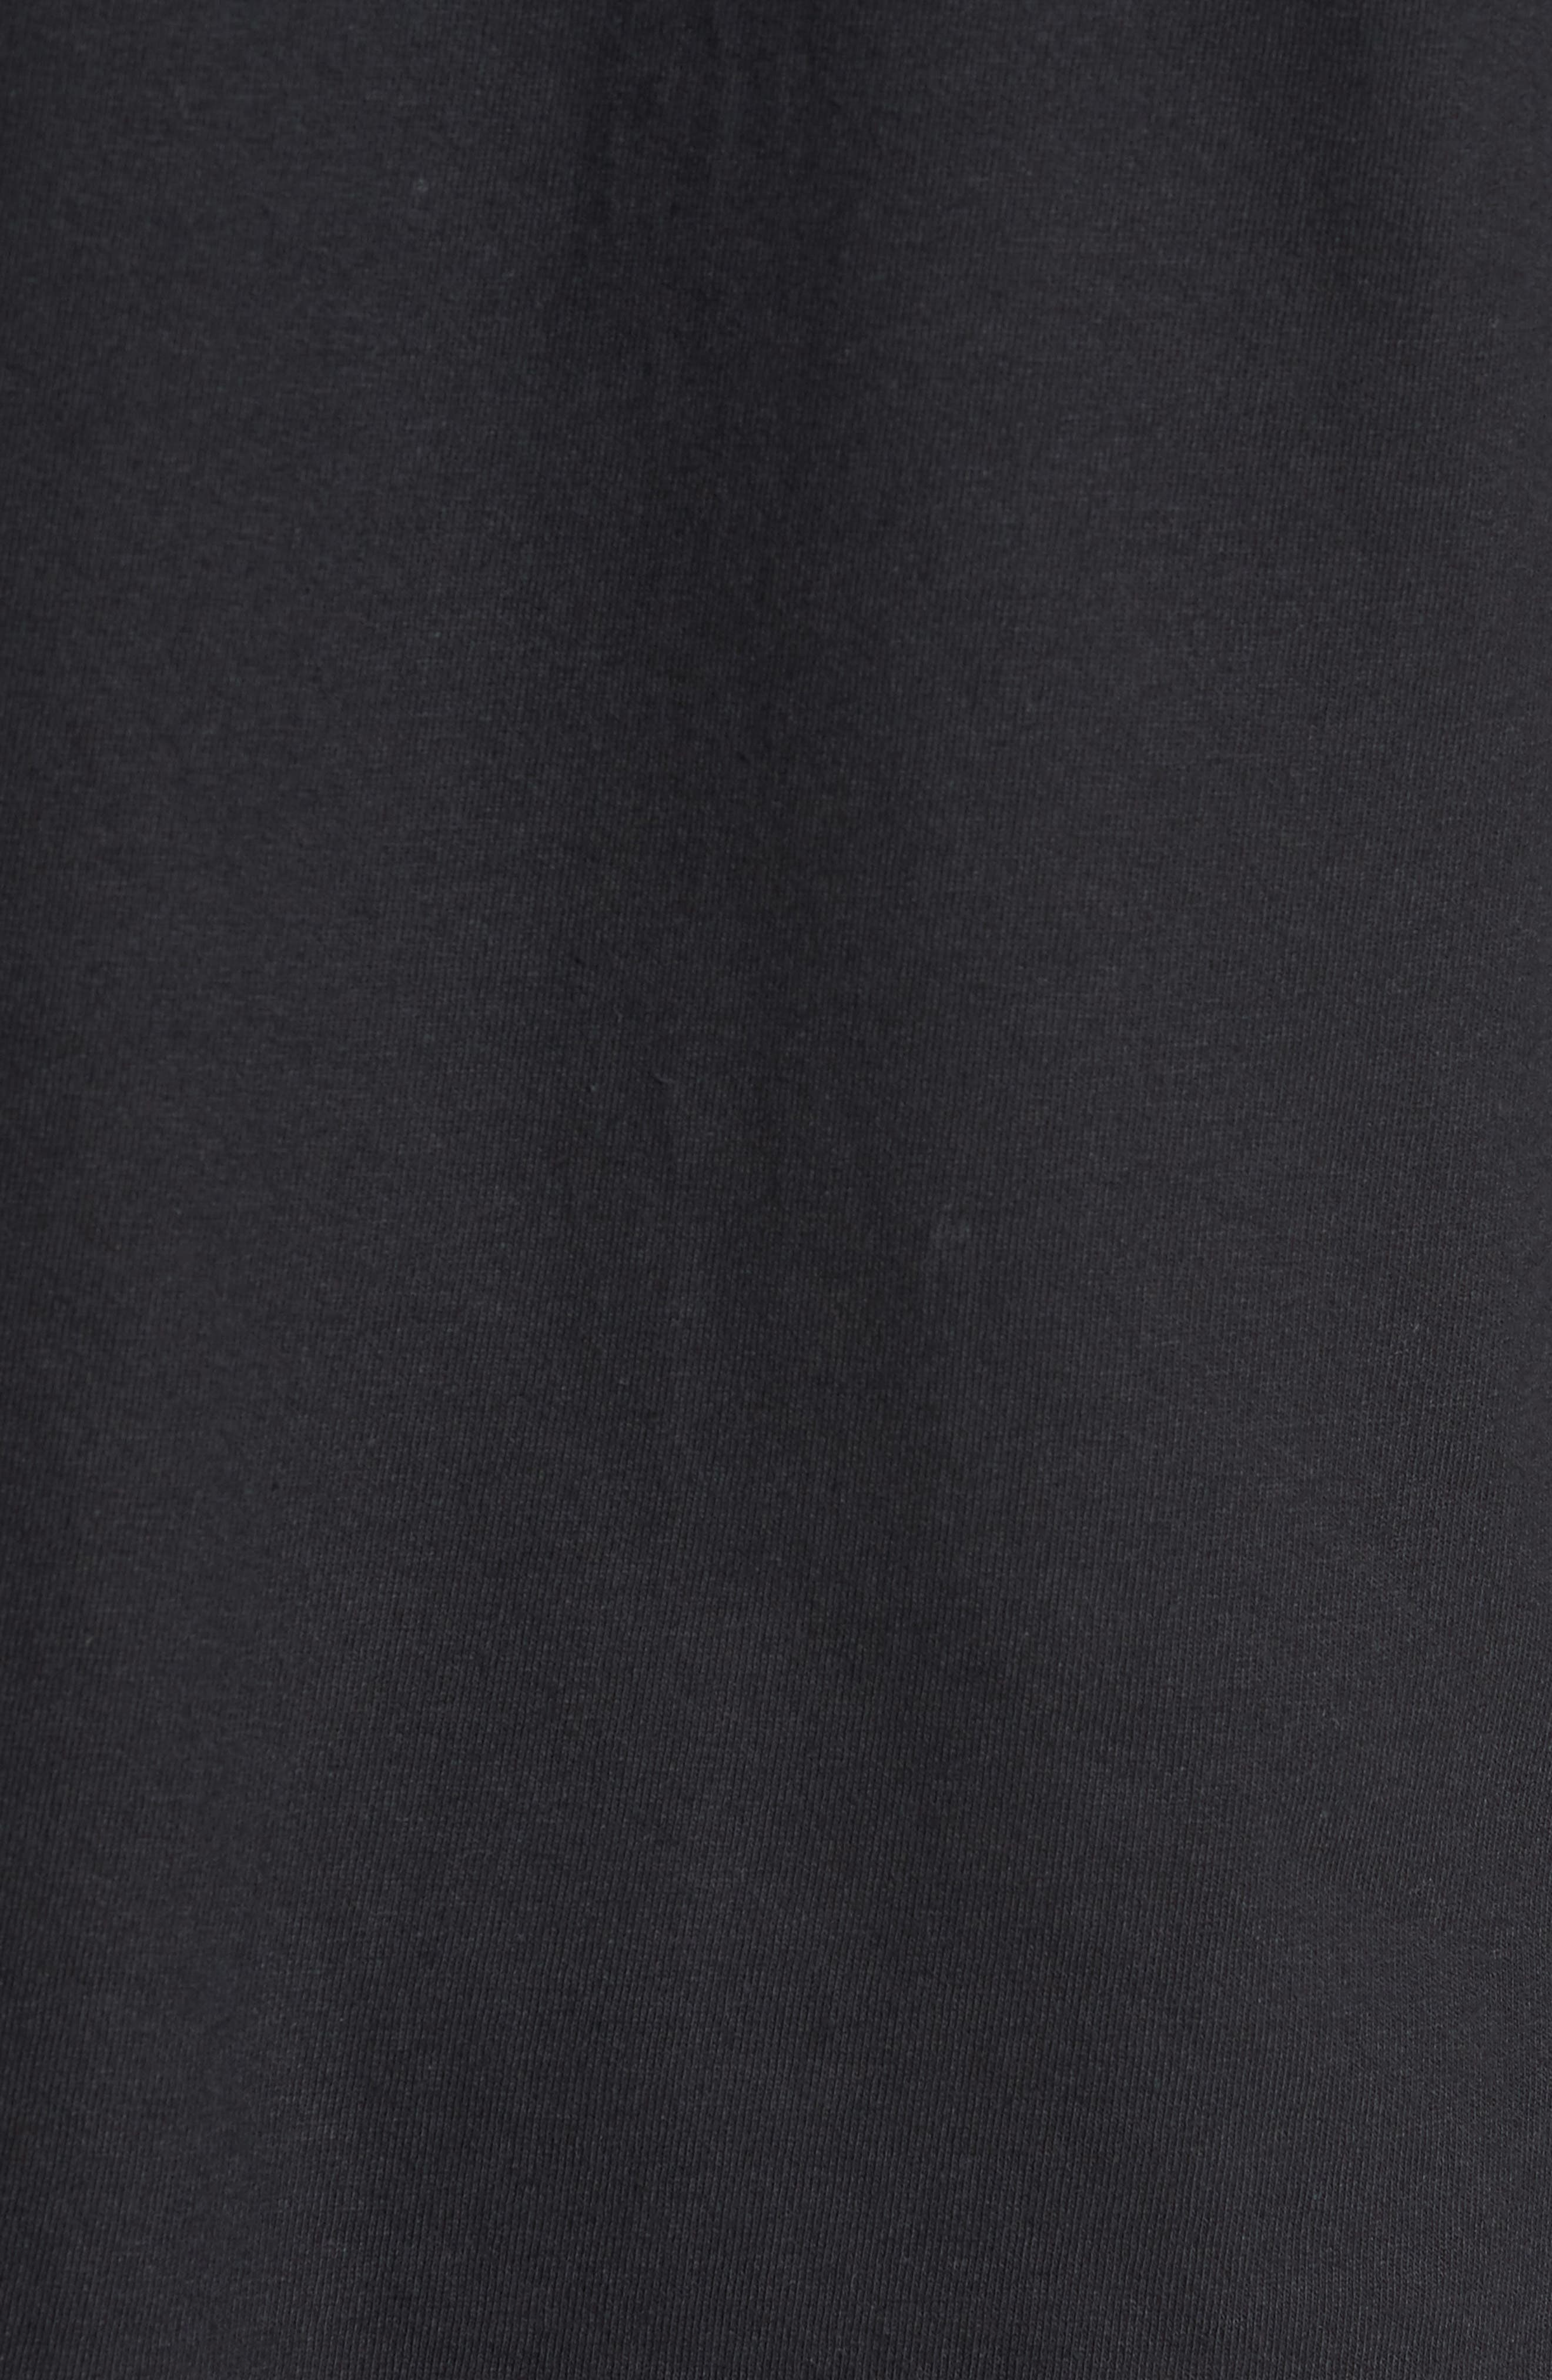 Ice Cube T-Shirt,                             Alternate thumbnail 5, color,                             Black Tee Ice Cube Face